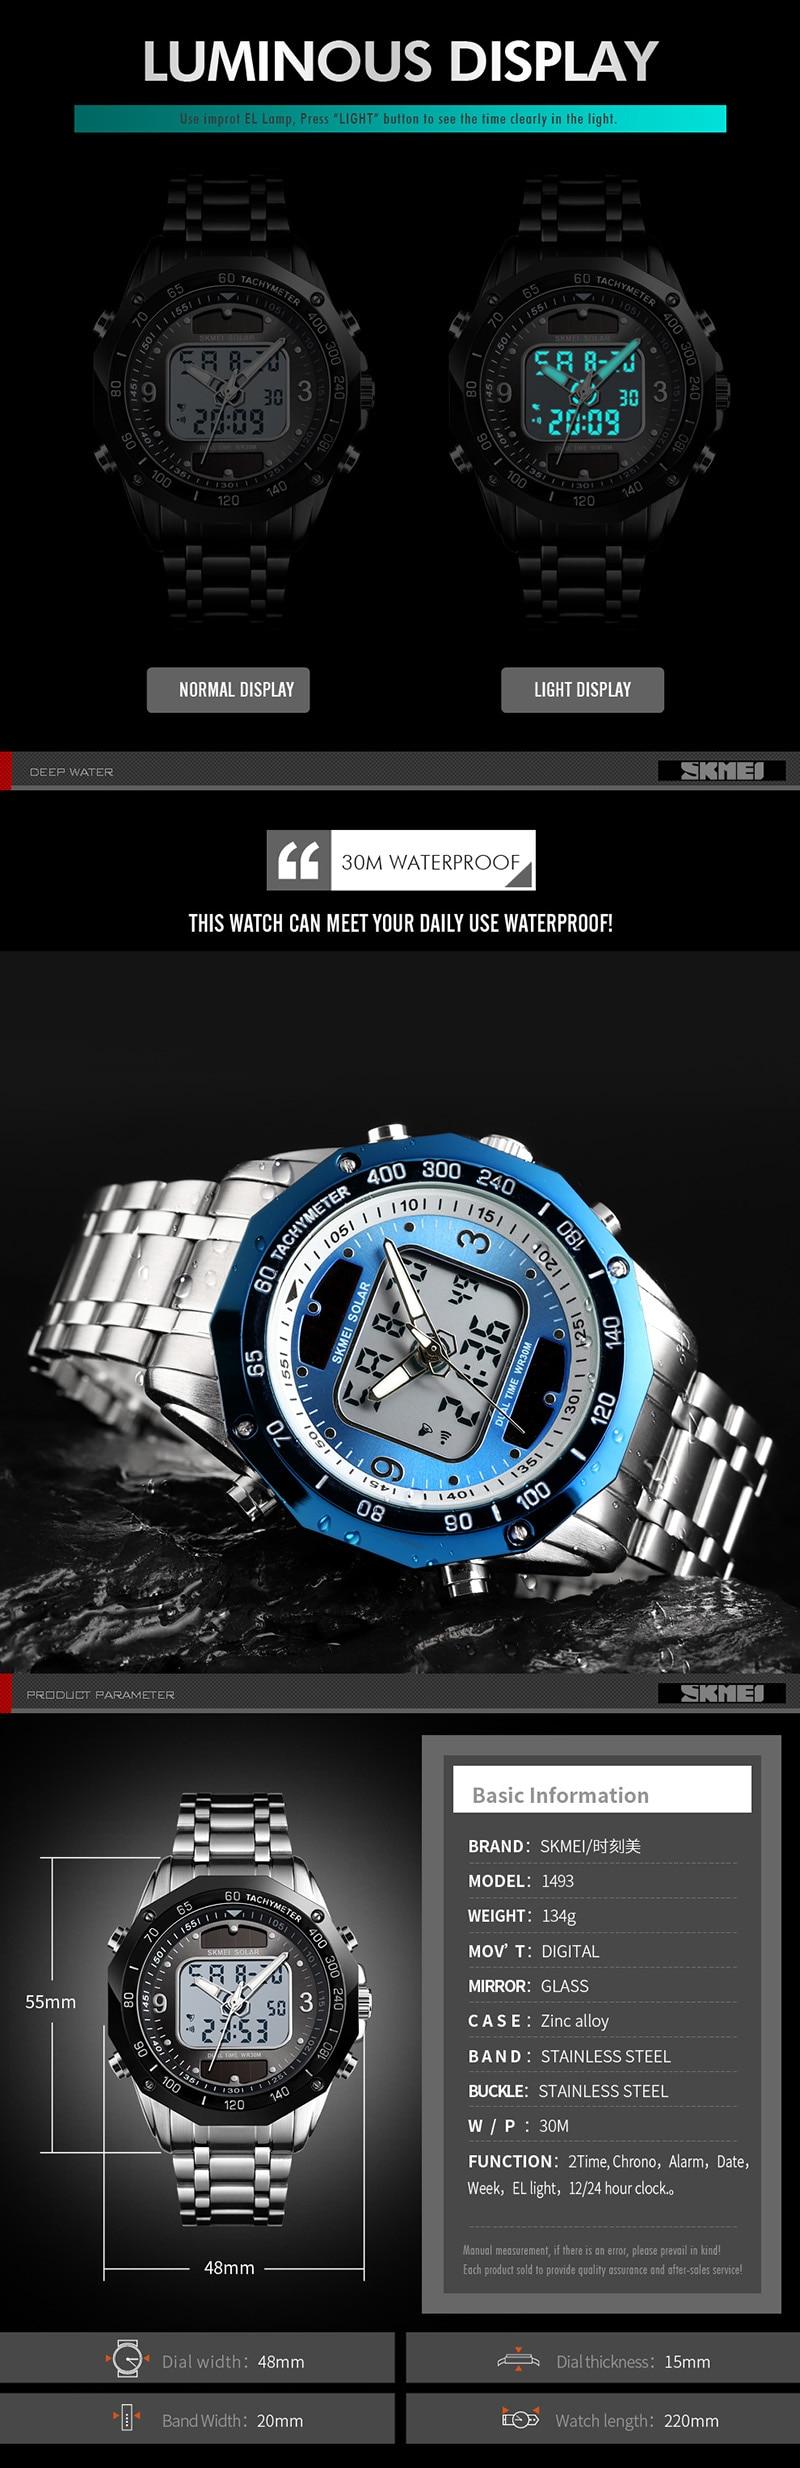 HTB12rOXUNTpK1RjSZFMq6zG VXaI Solar Men Military Sport Watches Men's Digital Quartz Clock Full Steel Waterproof Wrist Watch relojes hombre 2019 SKMEI